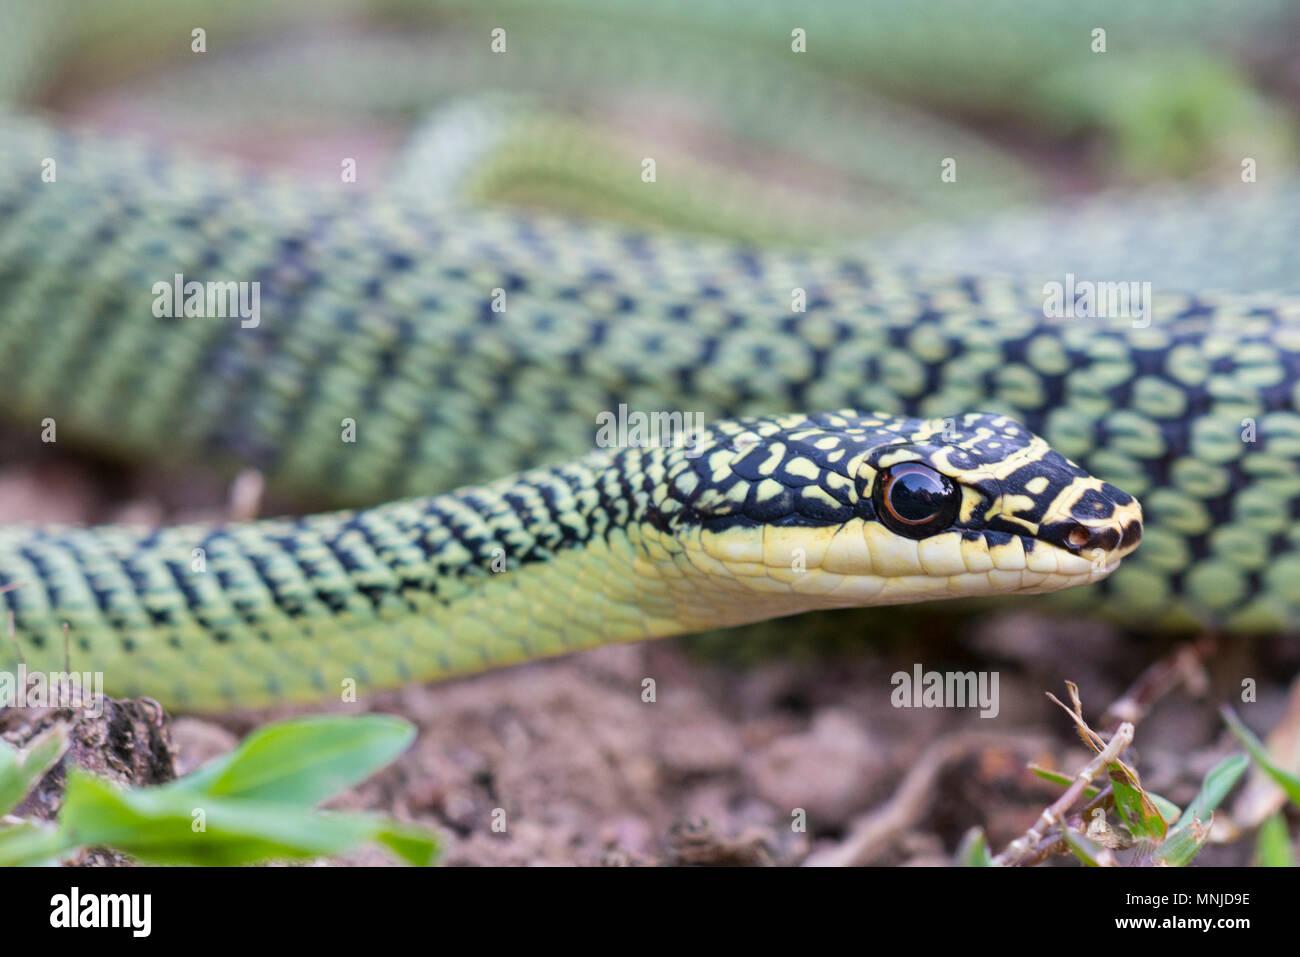 Very beautiful Golden Tree Snake (Chrysopelea ornate) in Krabi Thailand on a tree. - Stock Image